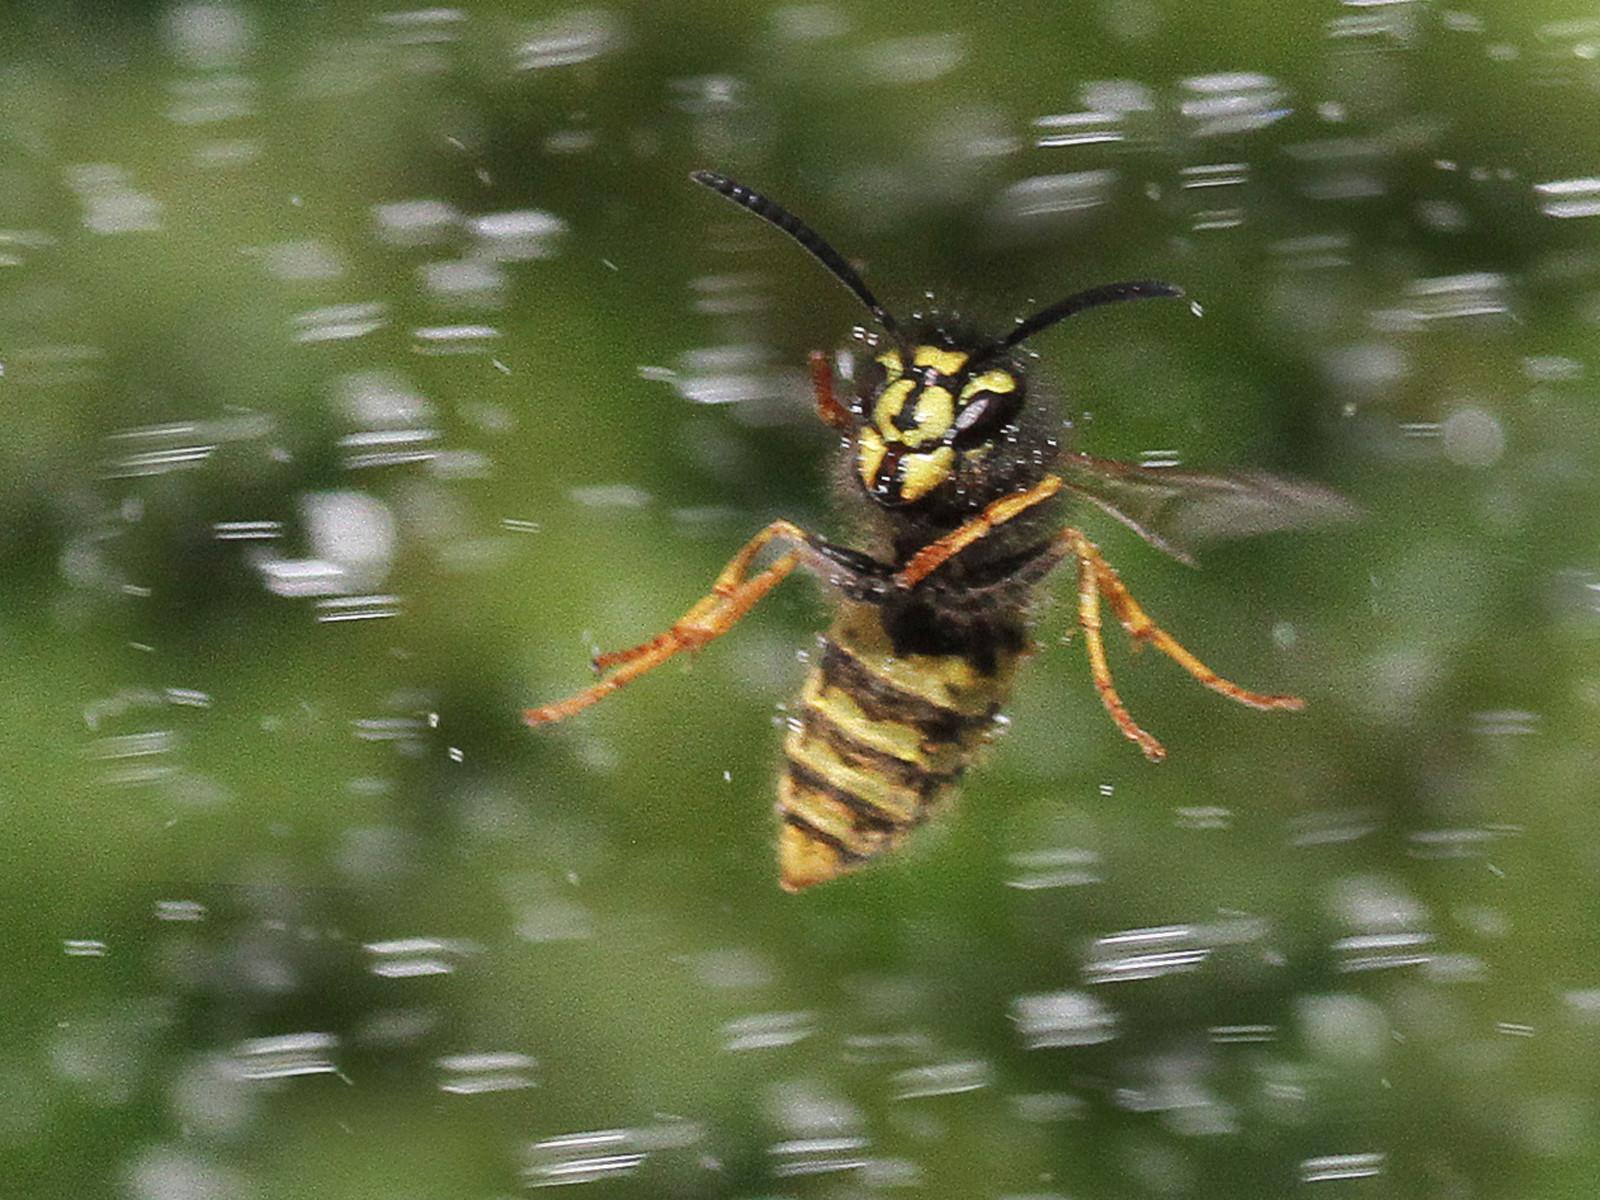 PDI - Wasp in storm by Brian McKenna (7.5 marks)